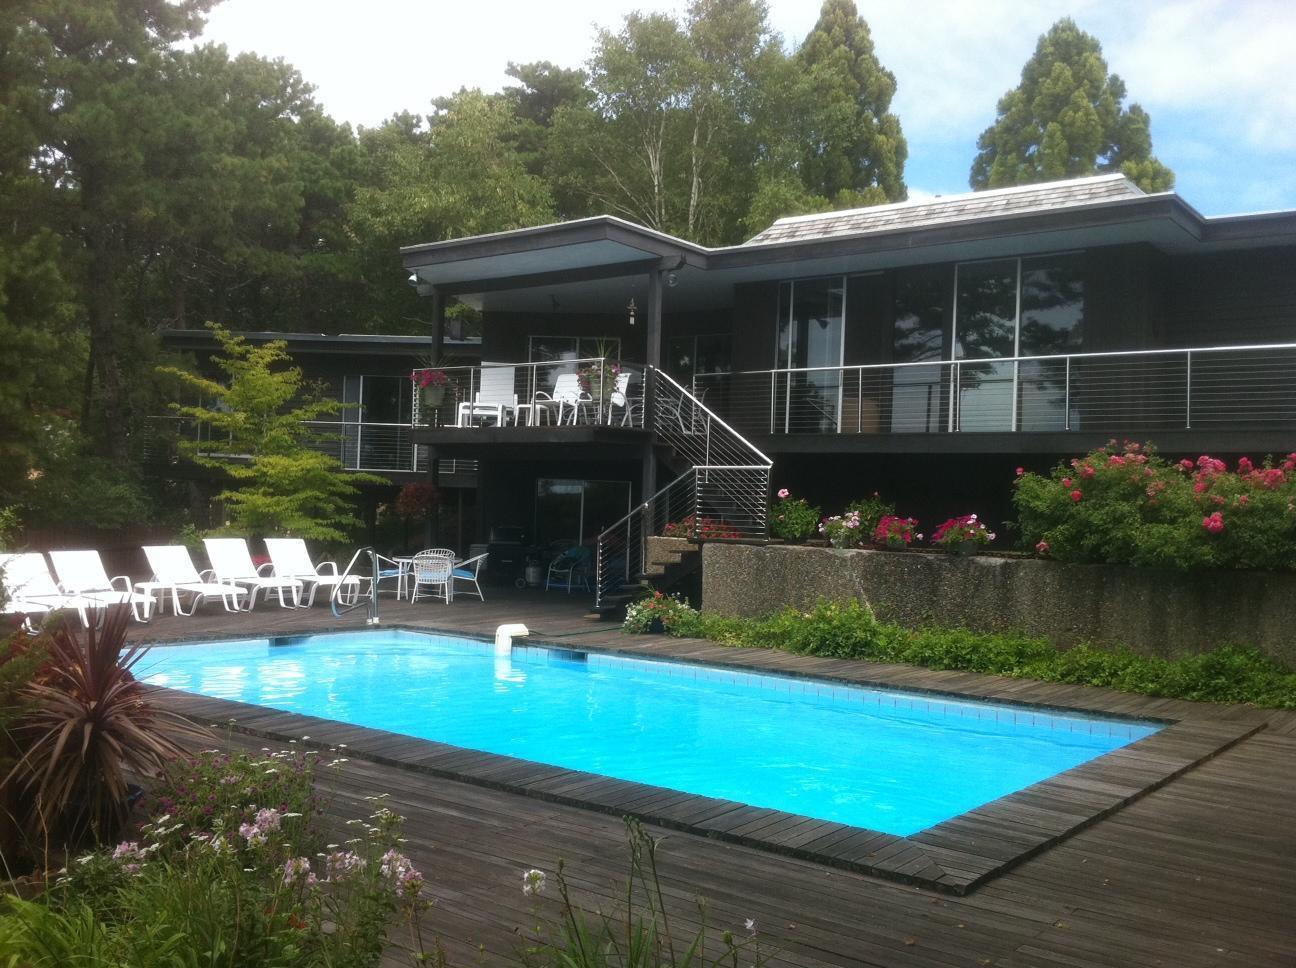 Truro Vacation Rental Home In Cape Cod Ma 02666 Id 7259